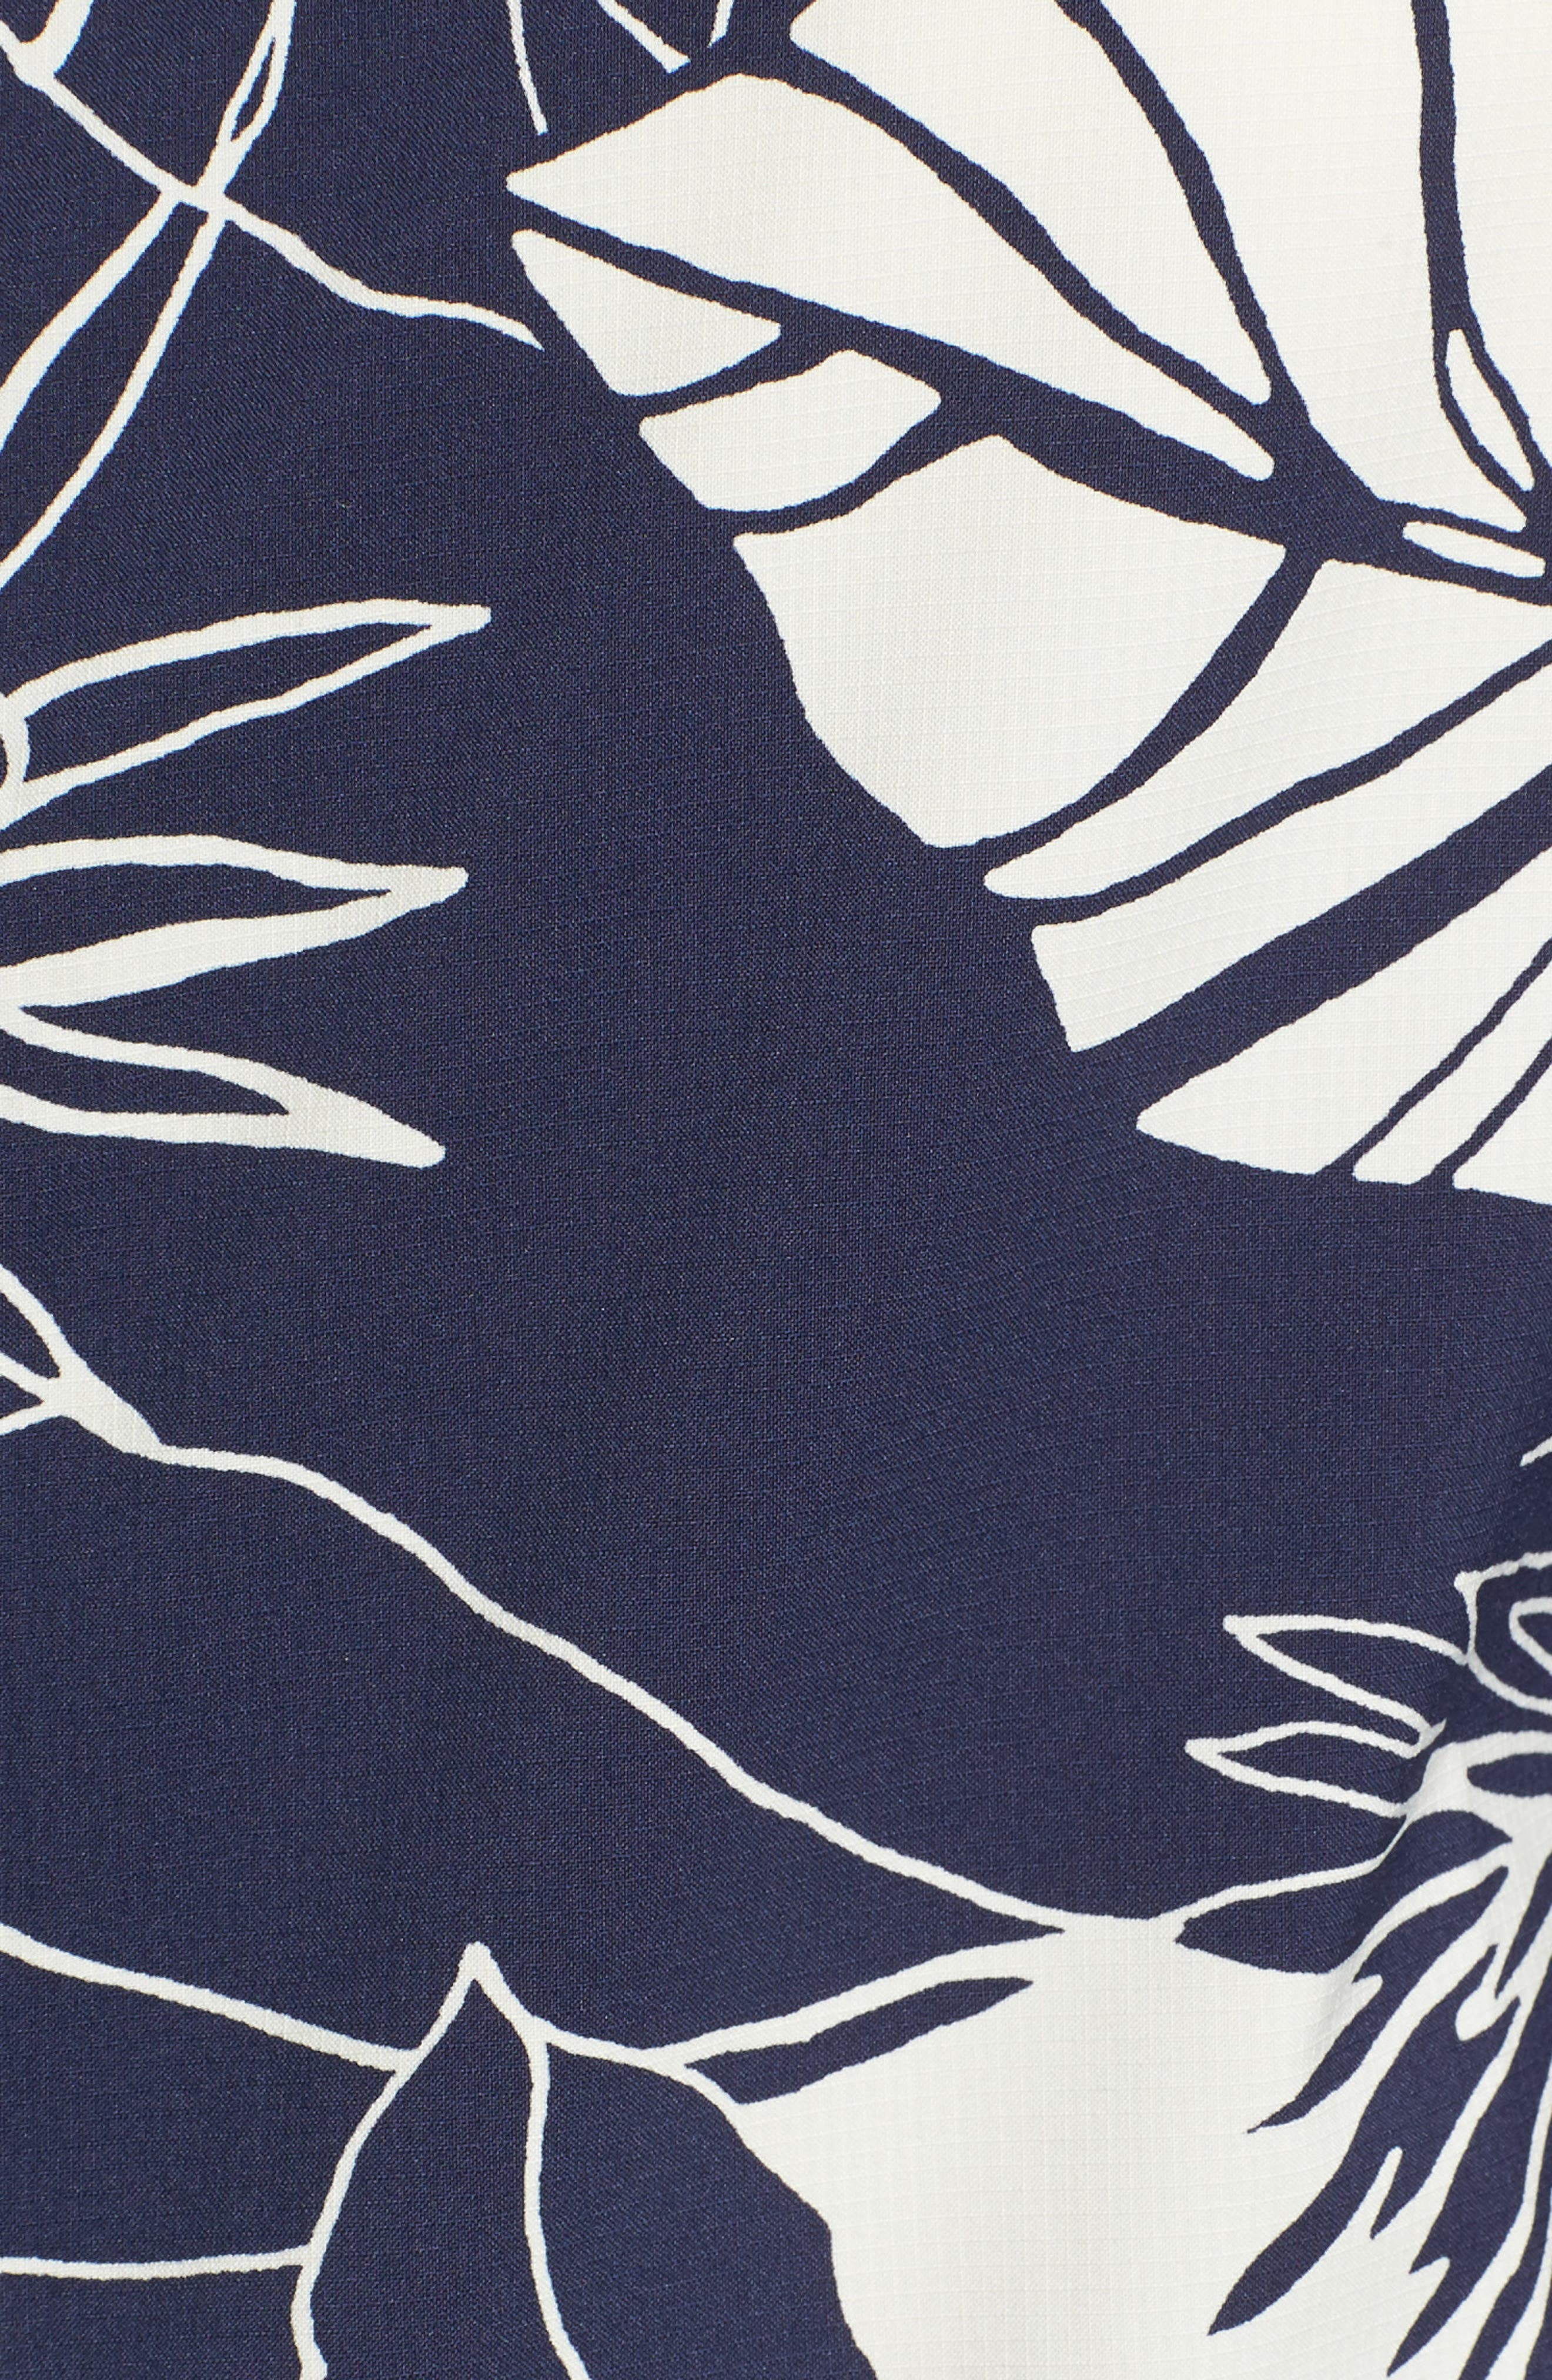 Bajadas Hoodie Jacket,                             Alternate thumbnail 6, color,                             Classic Navy/ Birch White